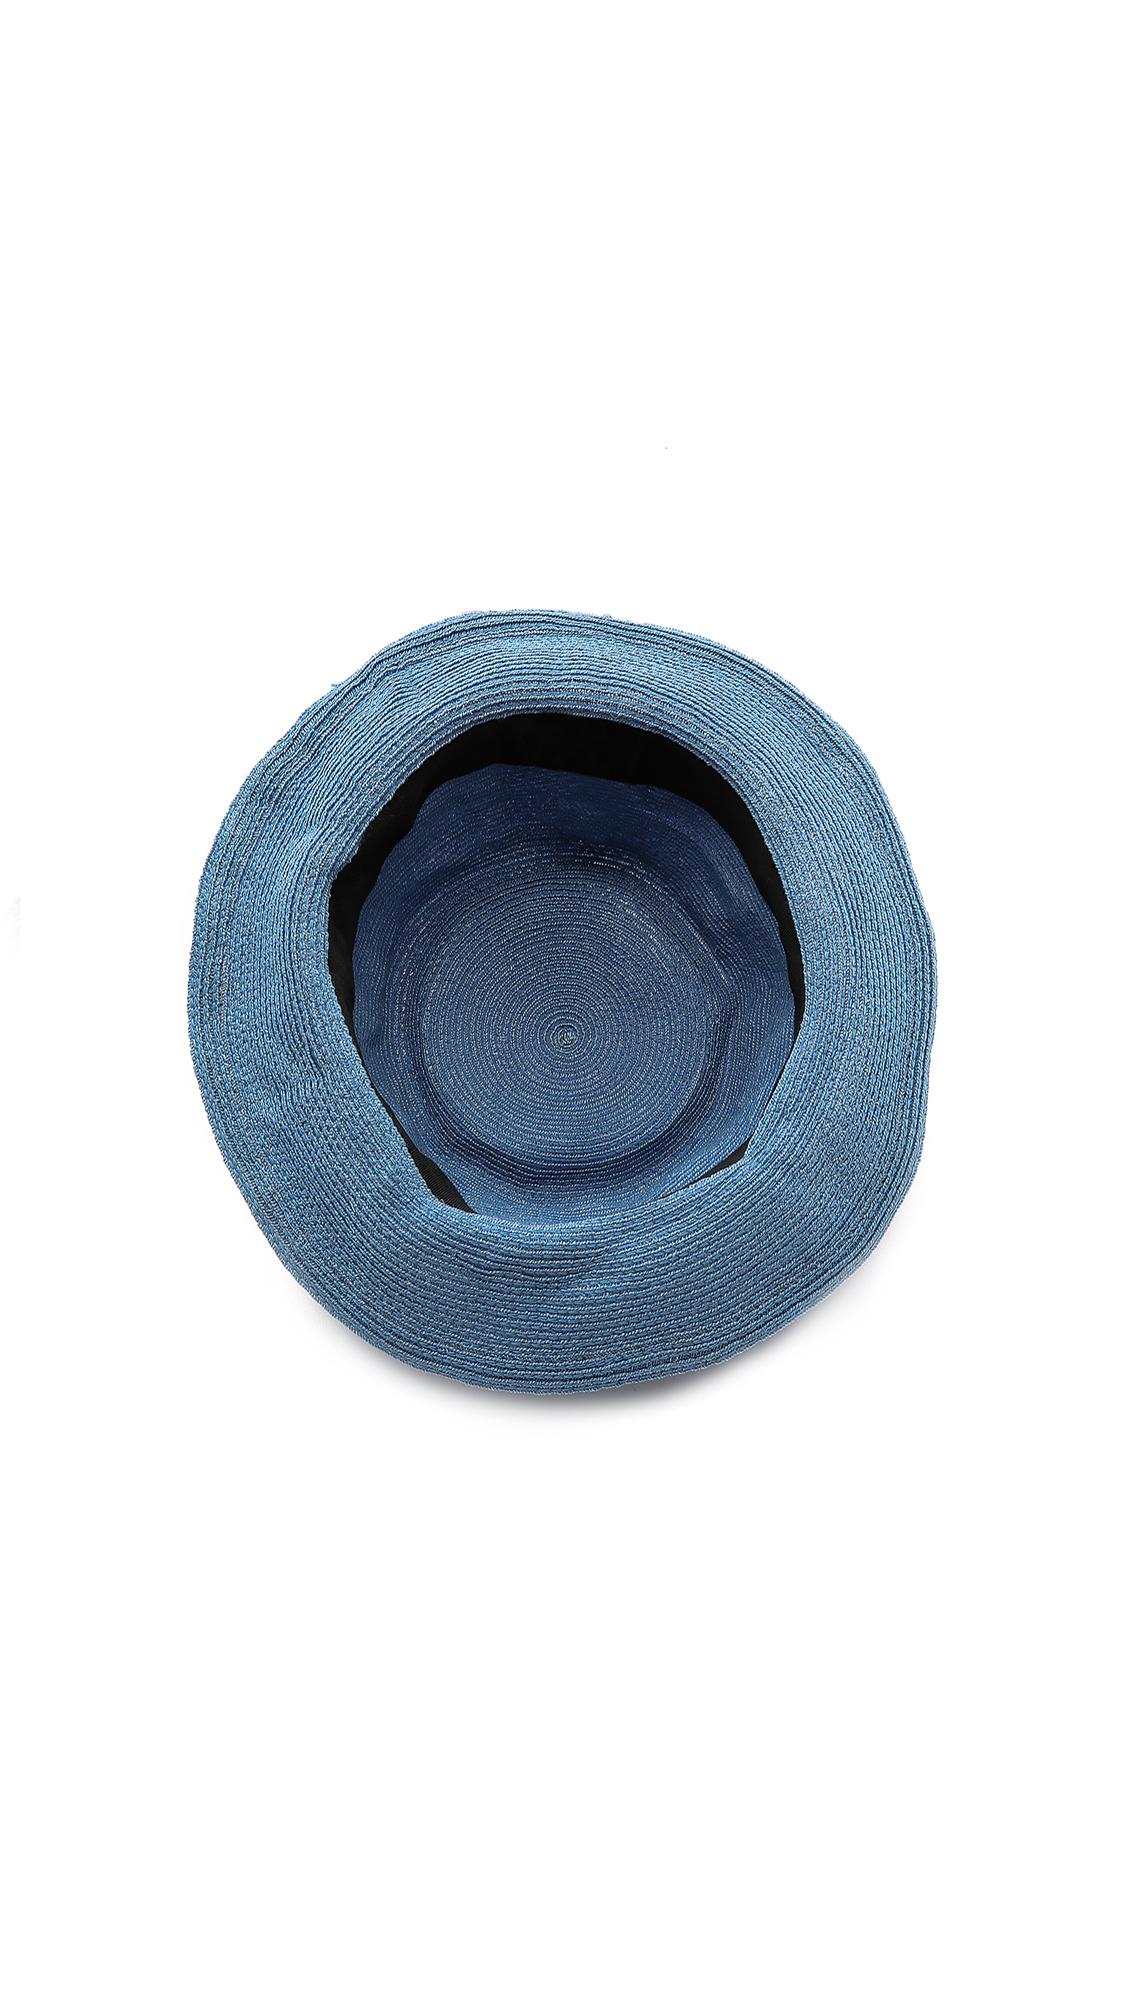 Lyst - Mr. Kim By Eugenia Kim Steve Straw Hat in Blue for Men